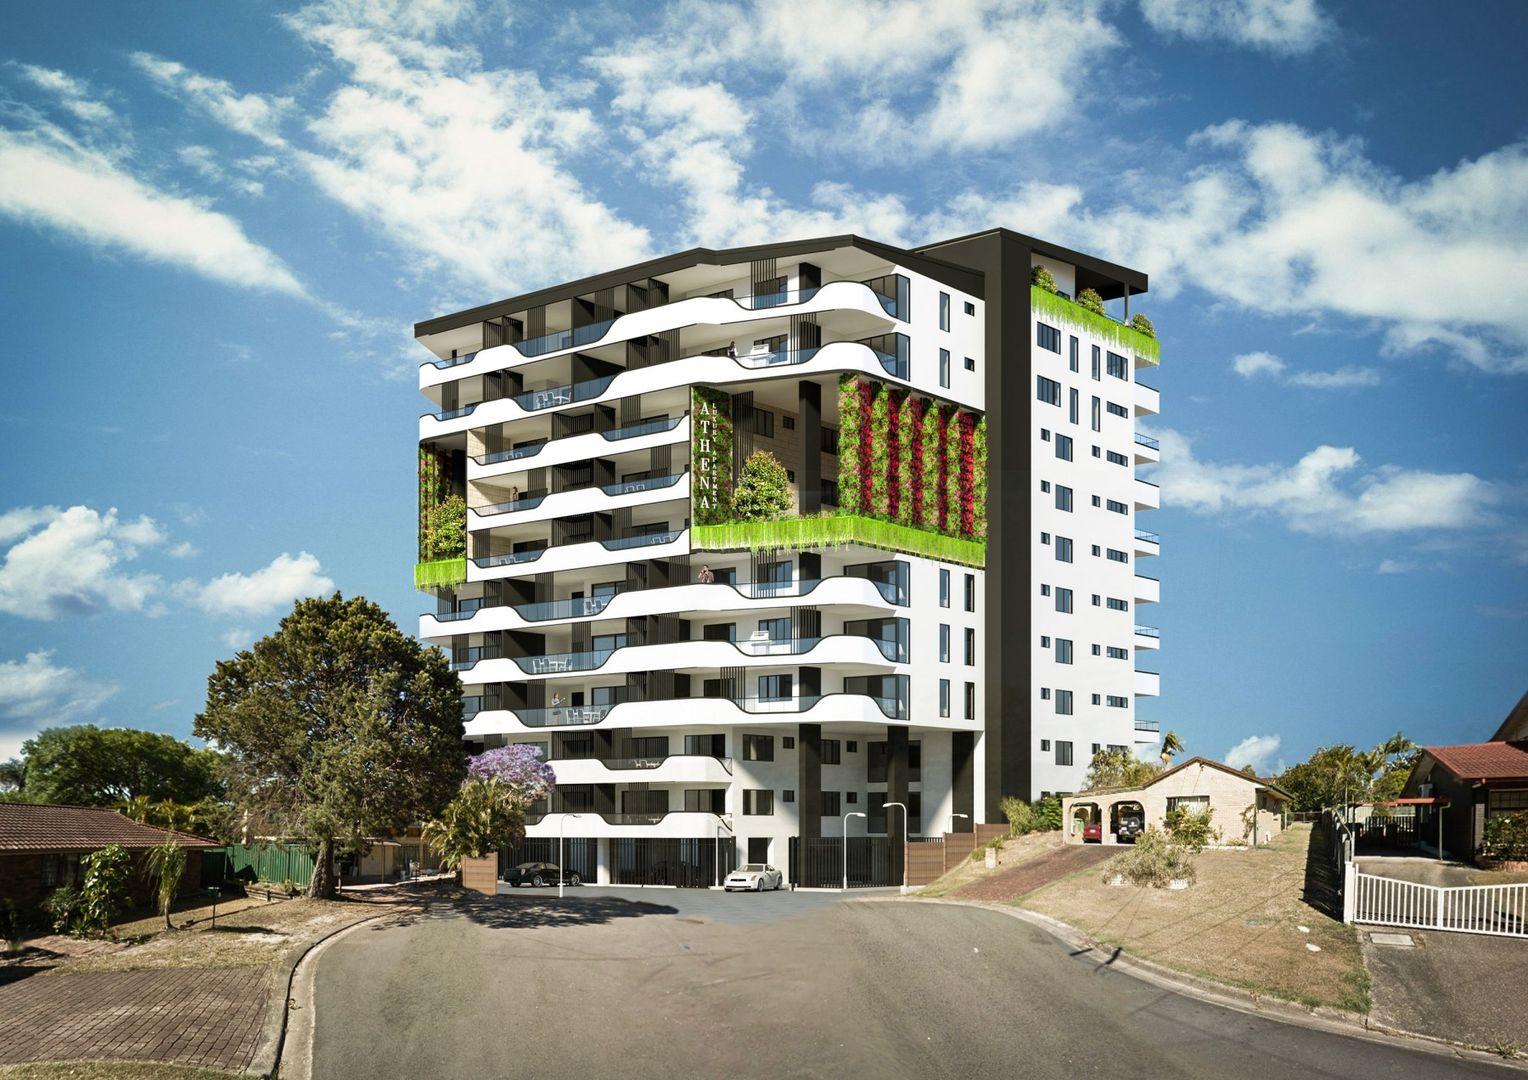 7 & 10 Athena Grove, Springwood QLD 4127, Image 2